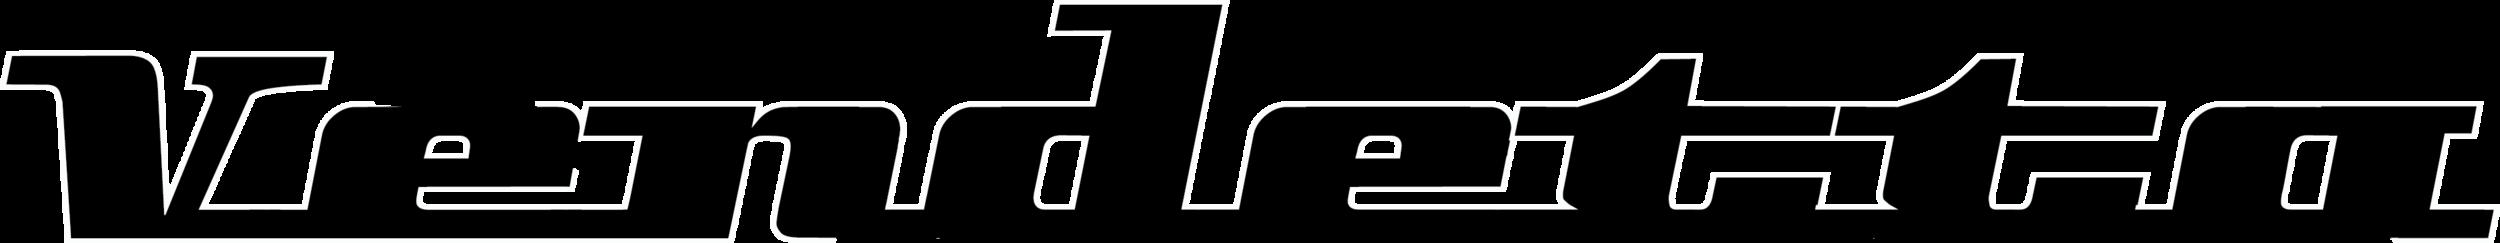 Vendetta_Logo.png